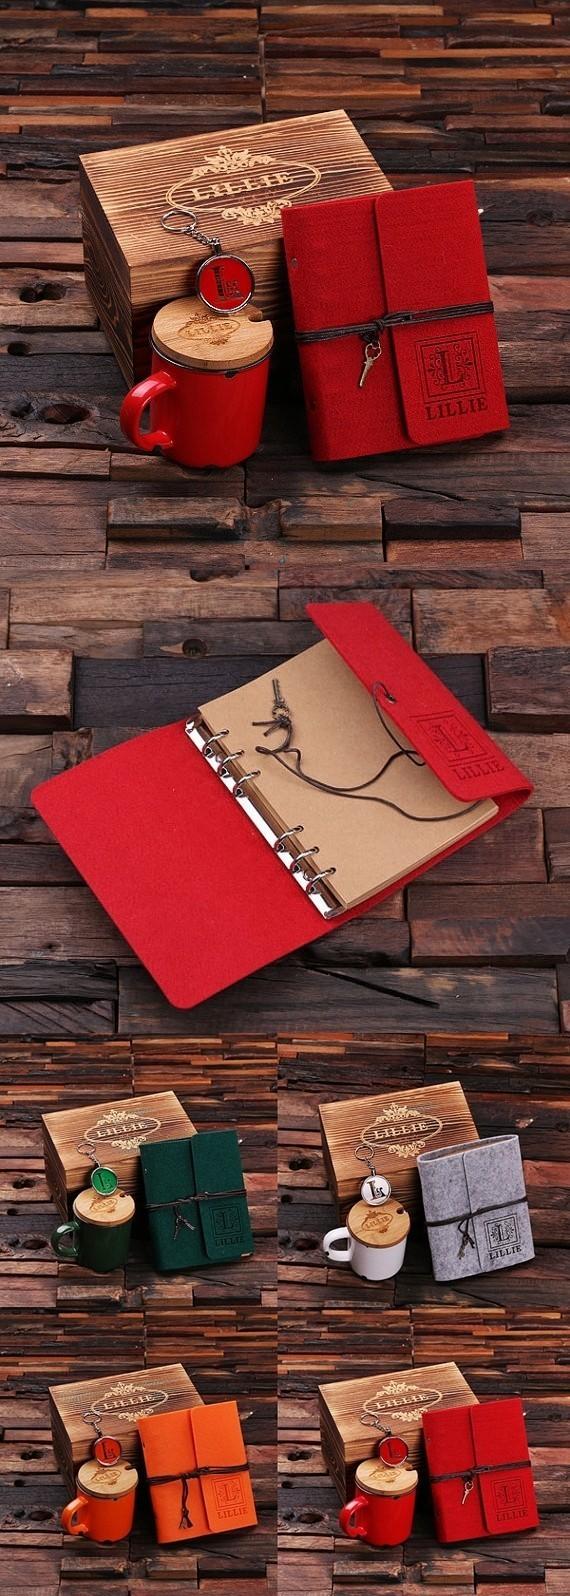 Personalized Felt Journal, Coffee Mug and Key Chain in Wood Gift Box